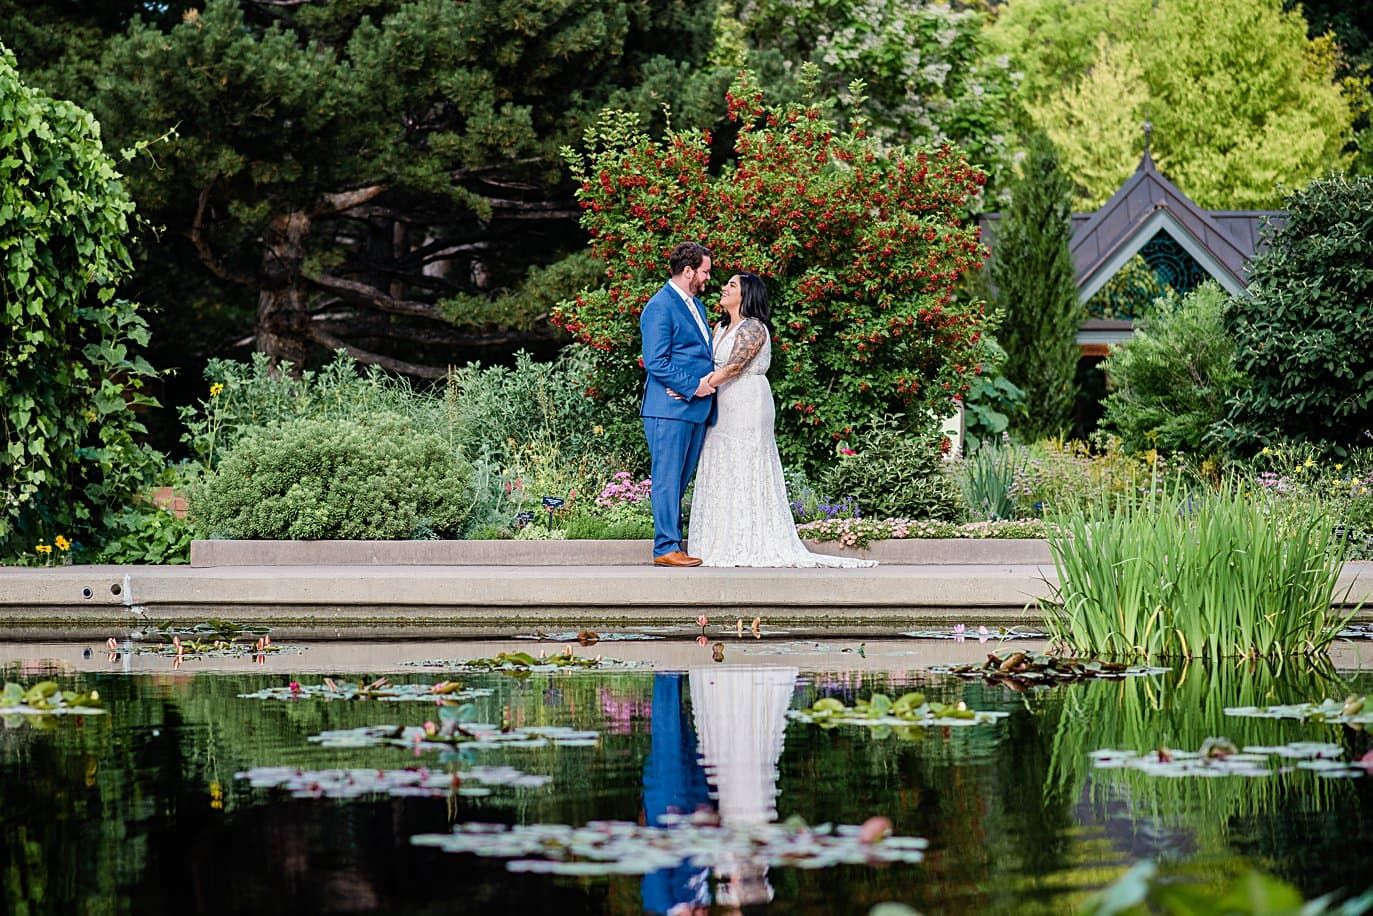 bride and groom during summer wedding at Denver Botanic Gardens wedding by Boulder Wedding Photographer Jennie Crate